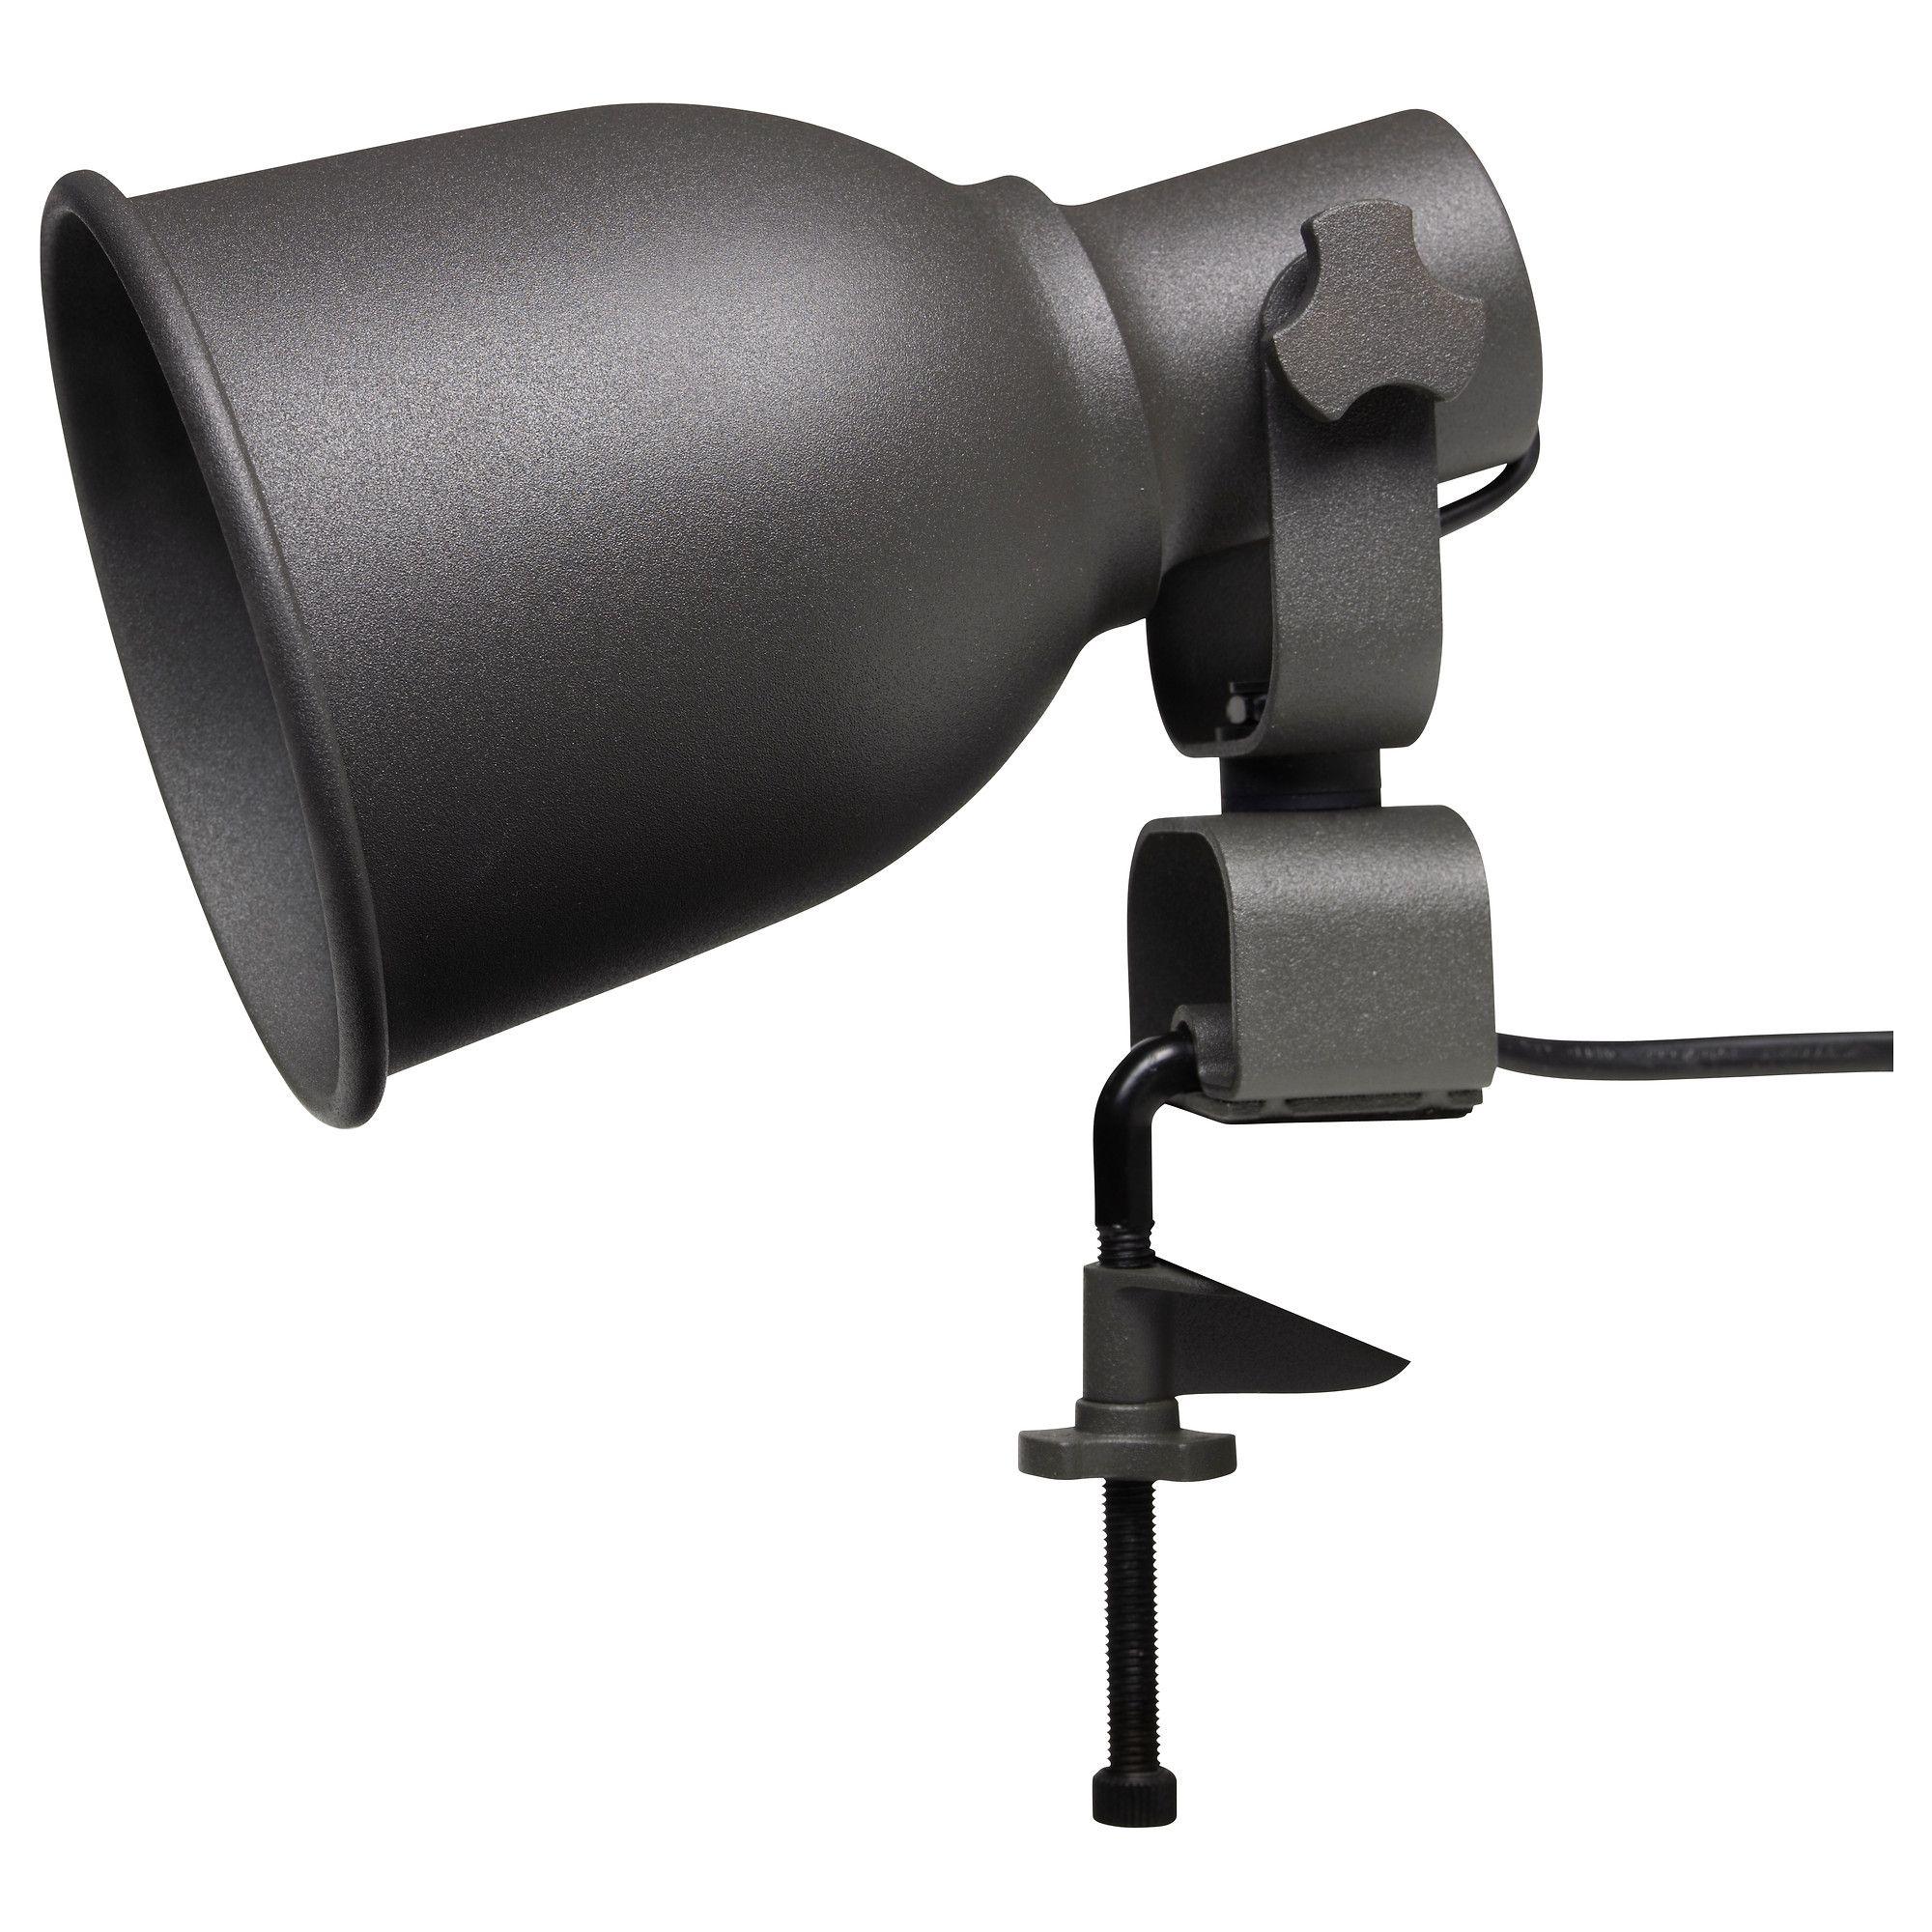 Hektar Wall Clamp Spotlight Dark Gray Clamp Lamp Ikea